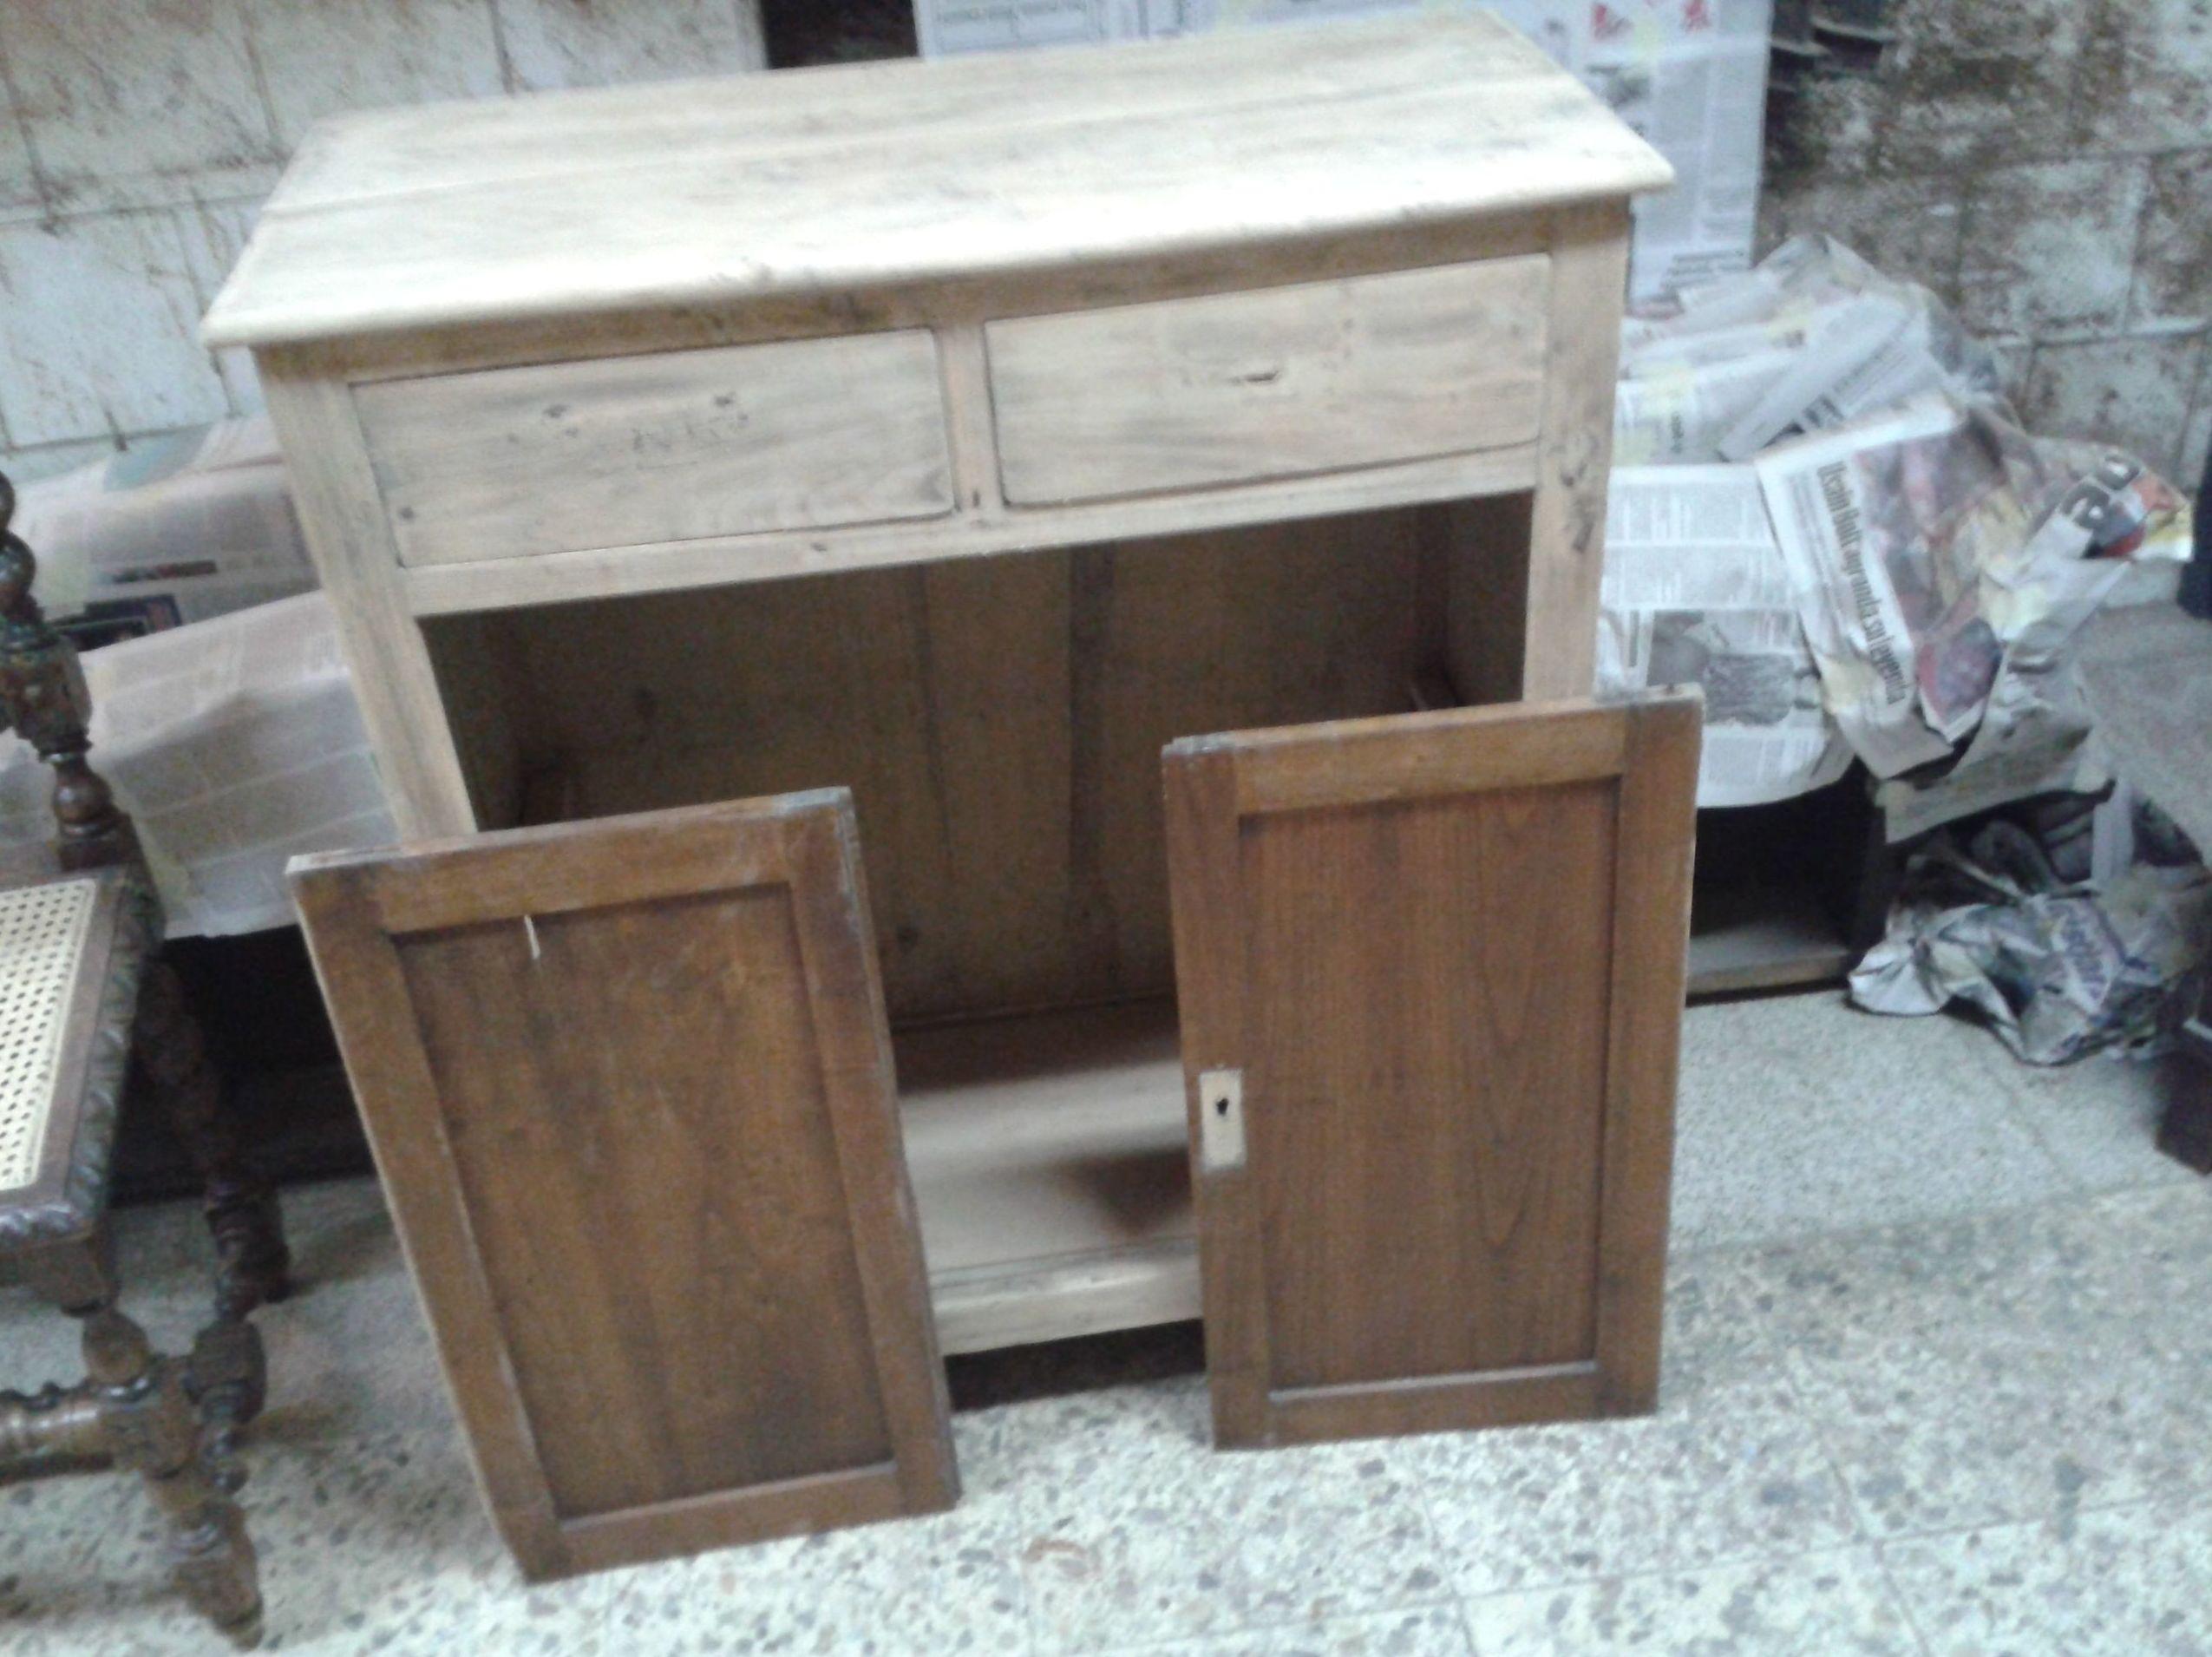 Foto 54 de Restauración de muebles en Pamplona | Lendik Restauración